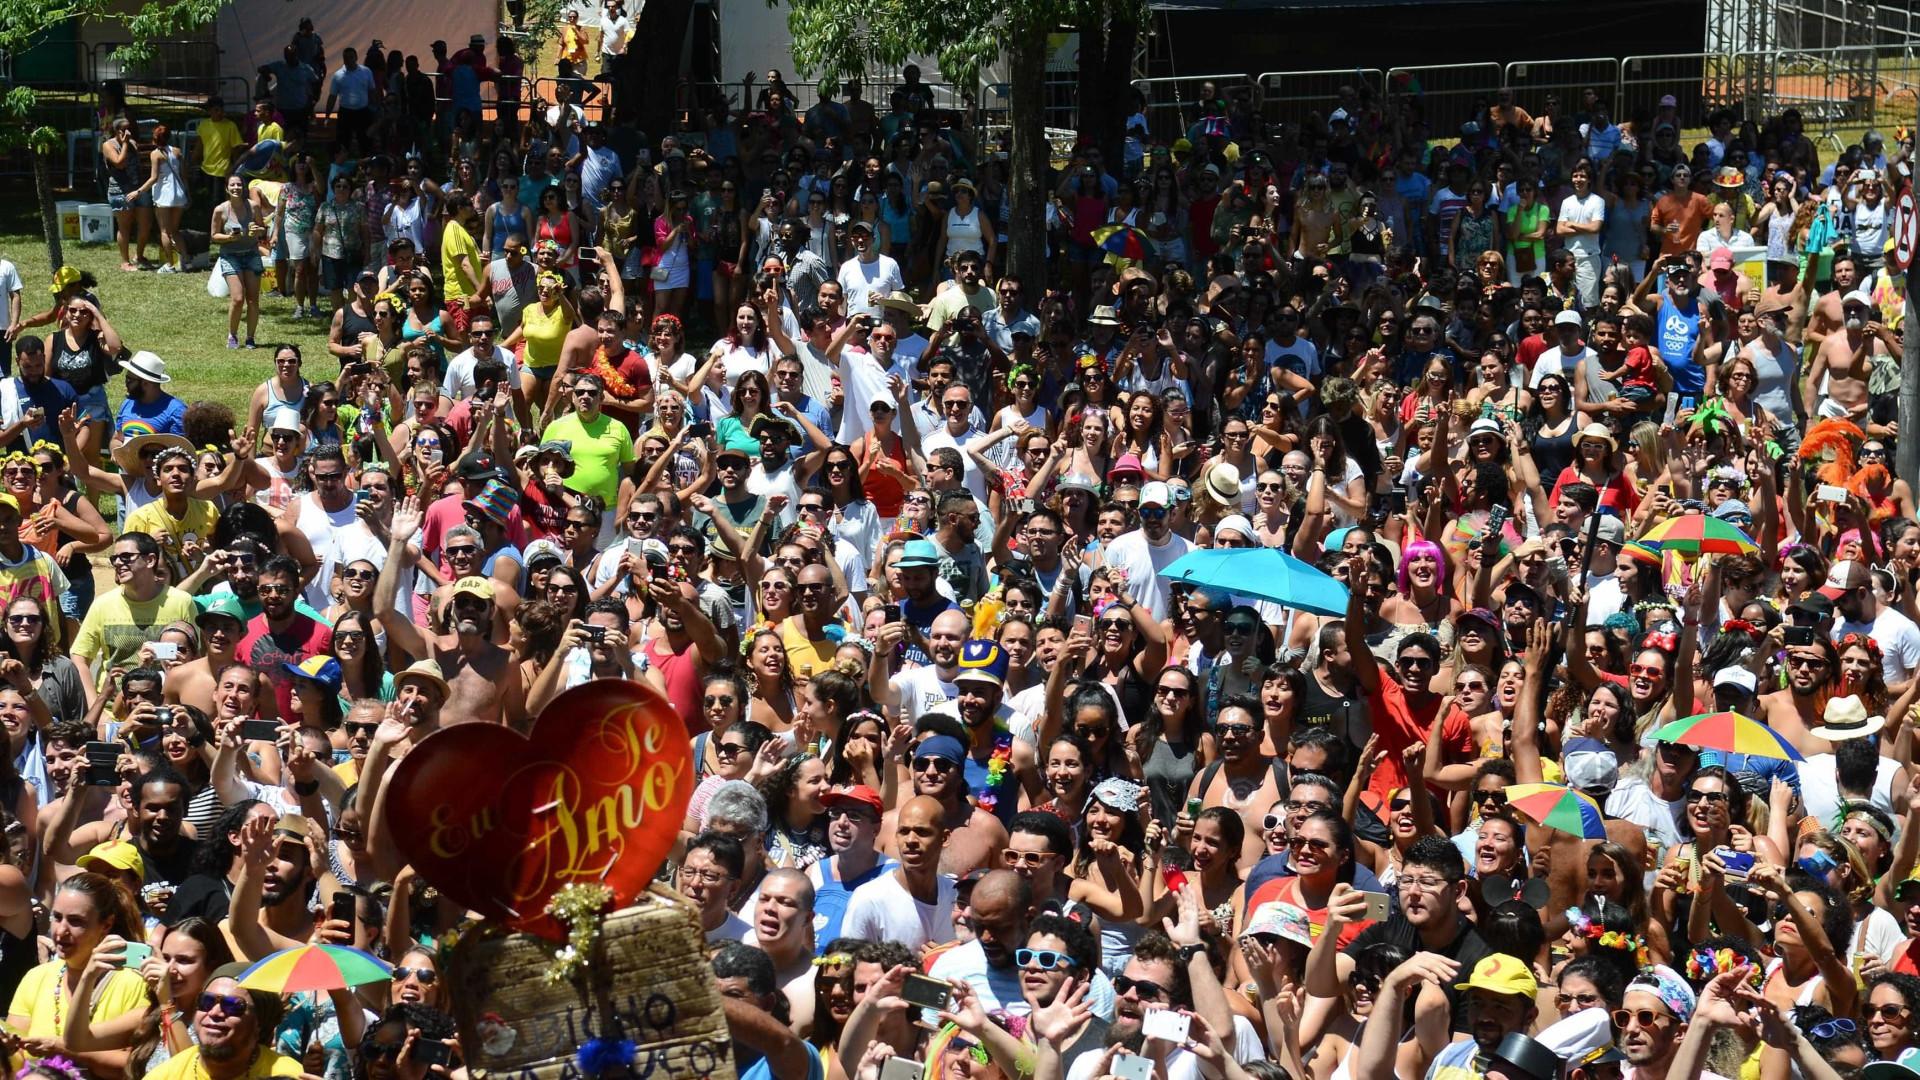 Em SP, pós-carnaval ainda terá 101 blocos